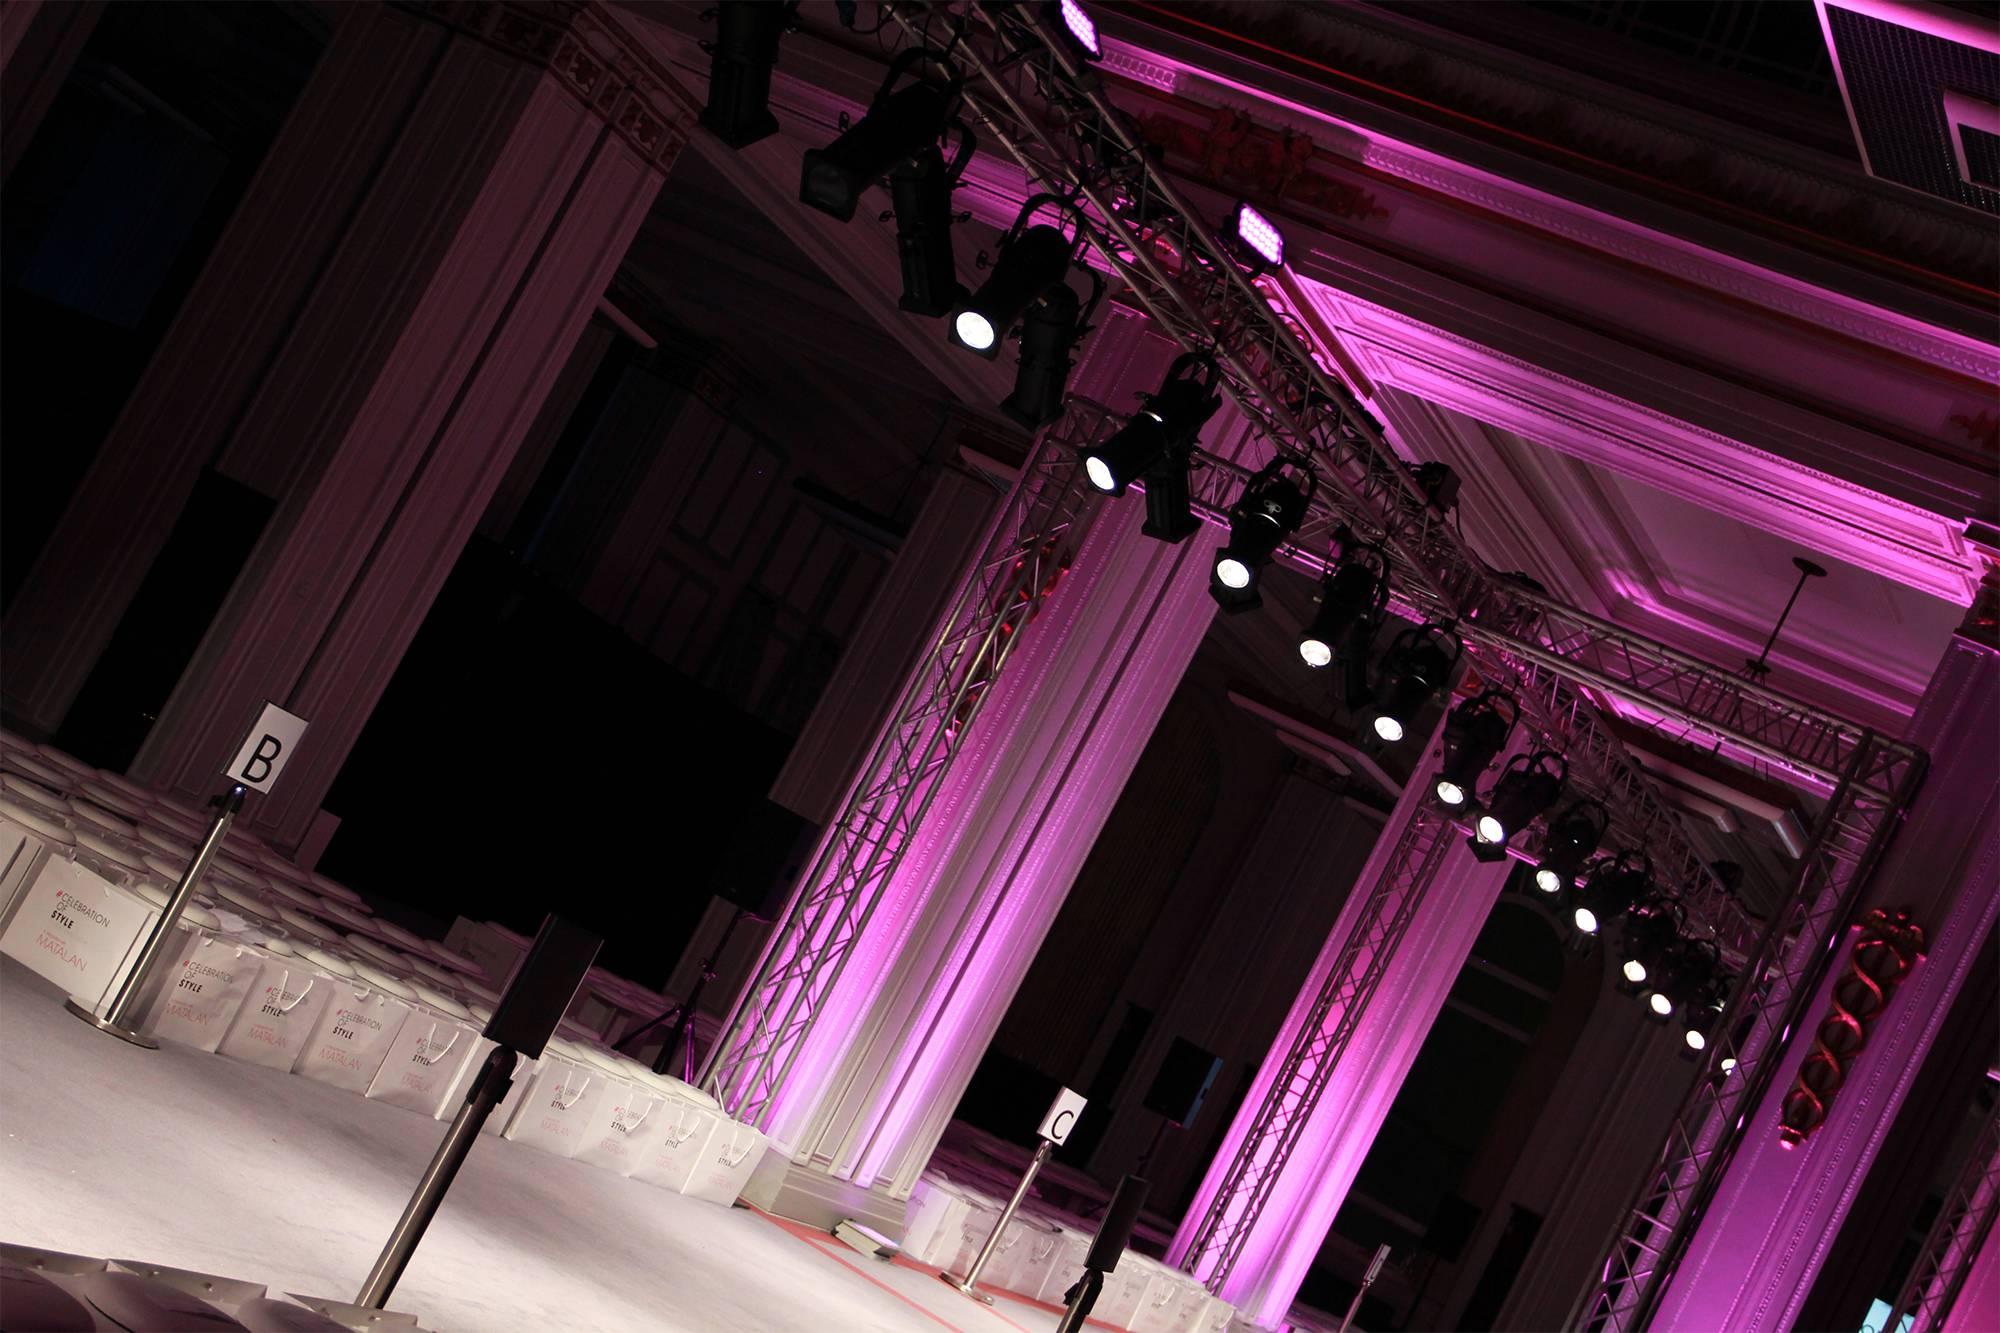 Catwalk Fashion Show Lighting Hire Liverpool